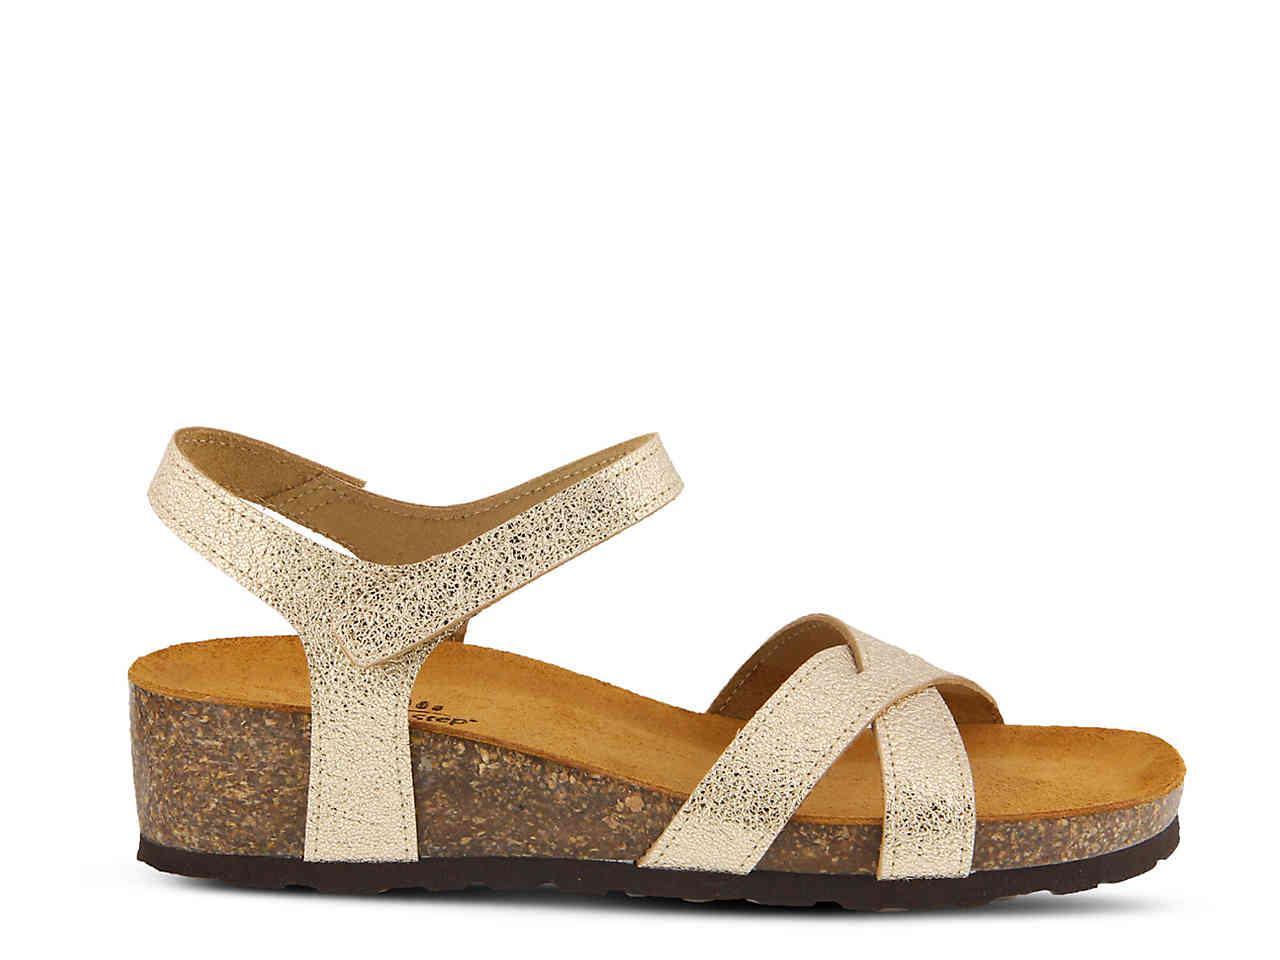 046794bc237 Lyst - Spring Step Anilia Wedge Sandal in Metallic